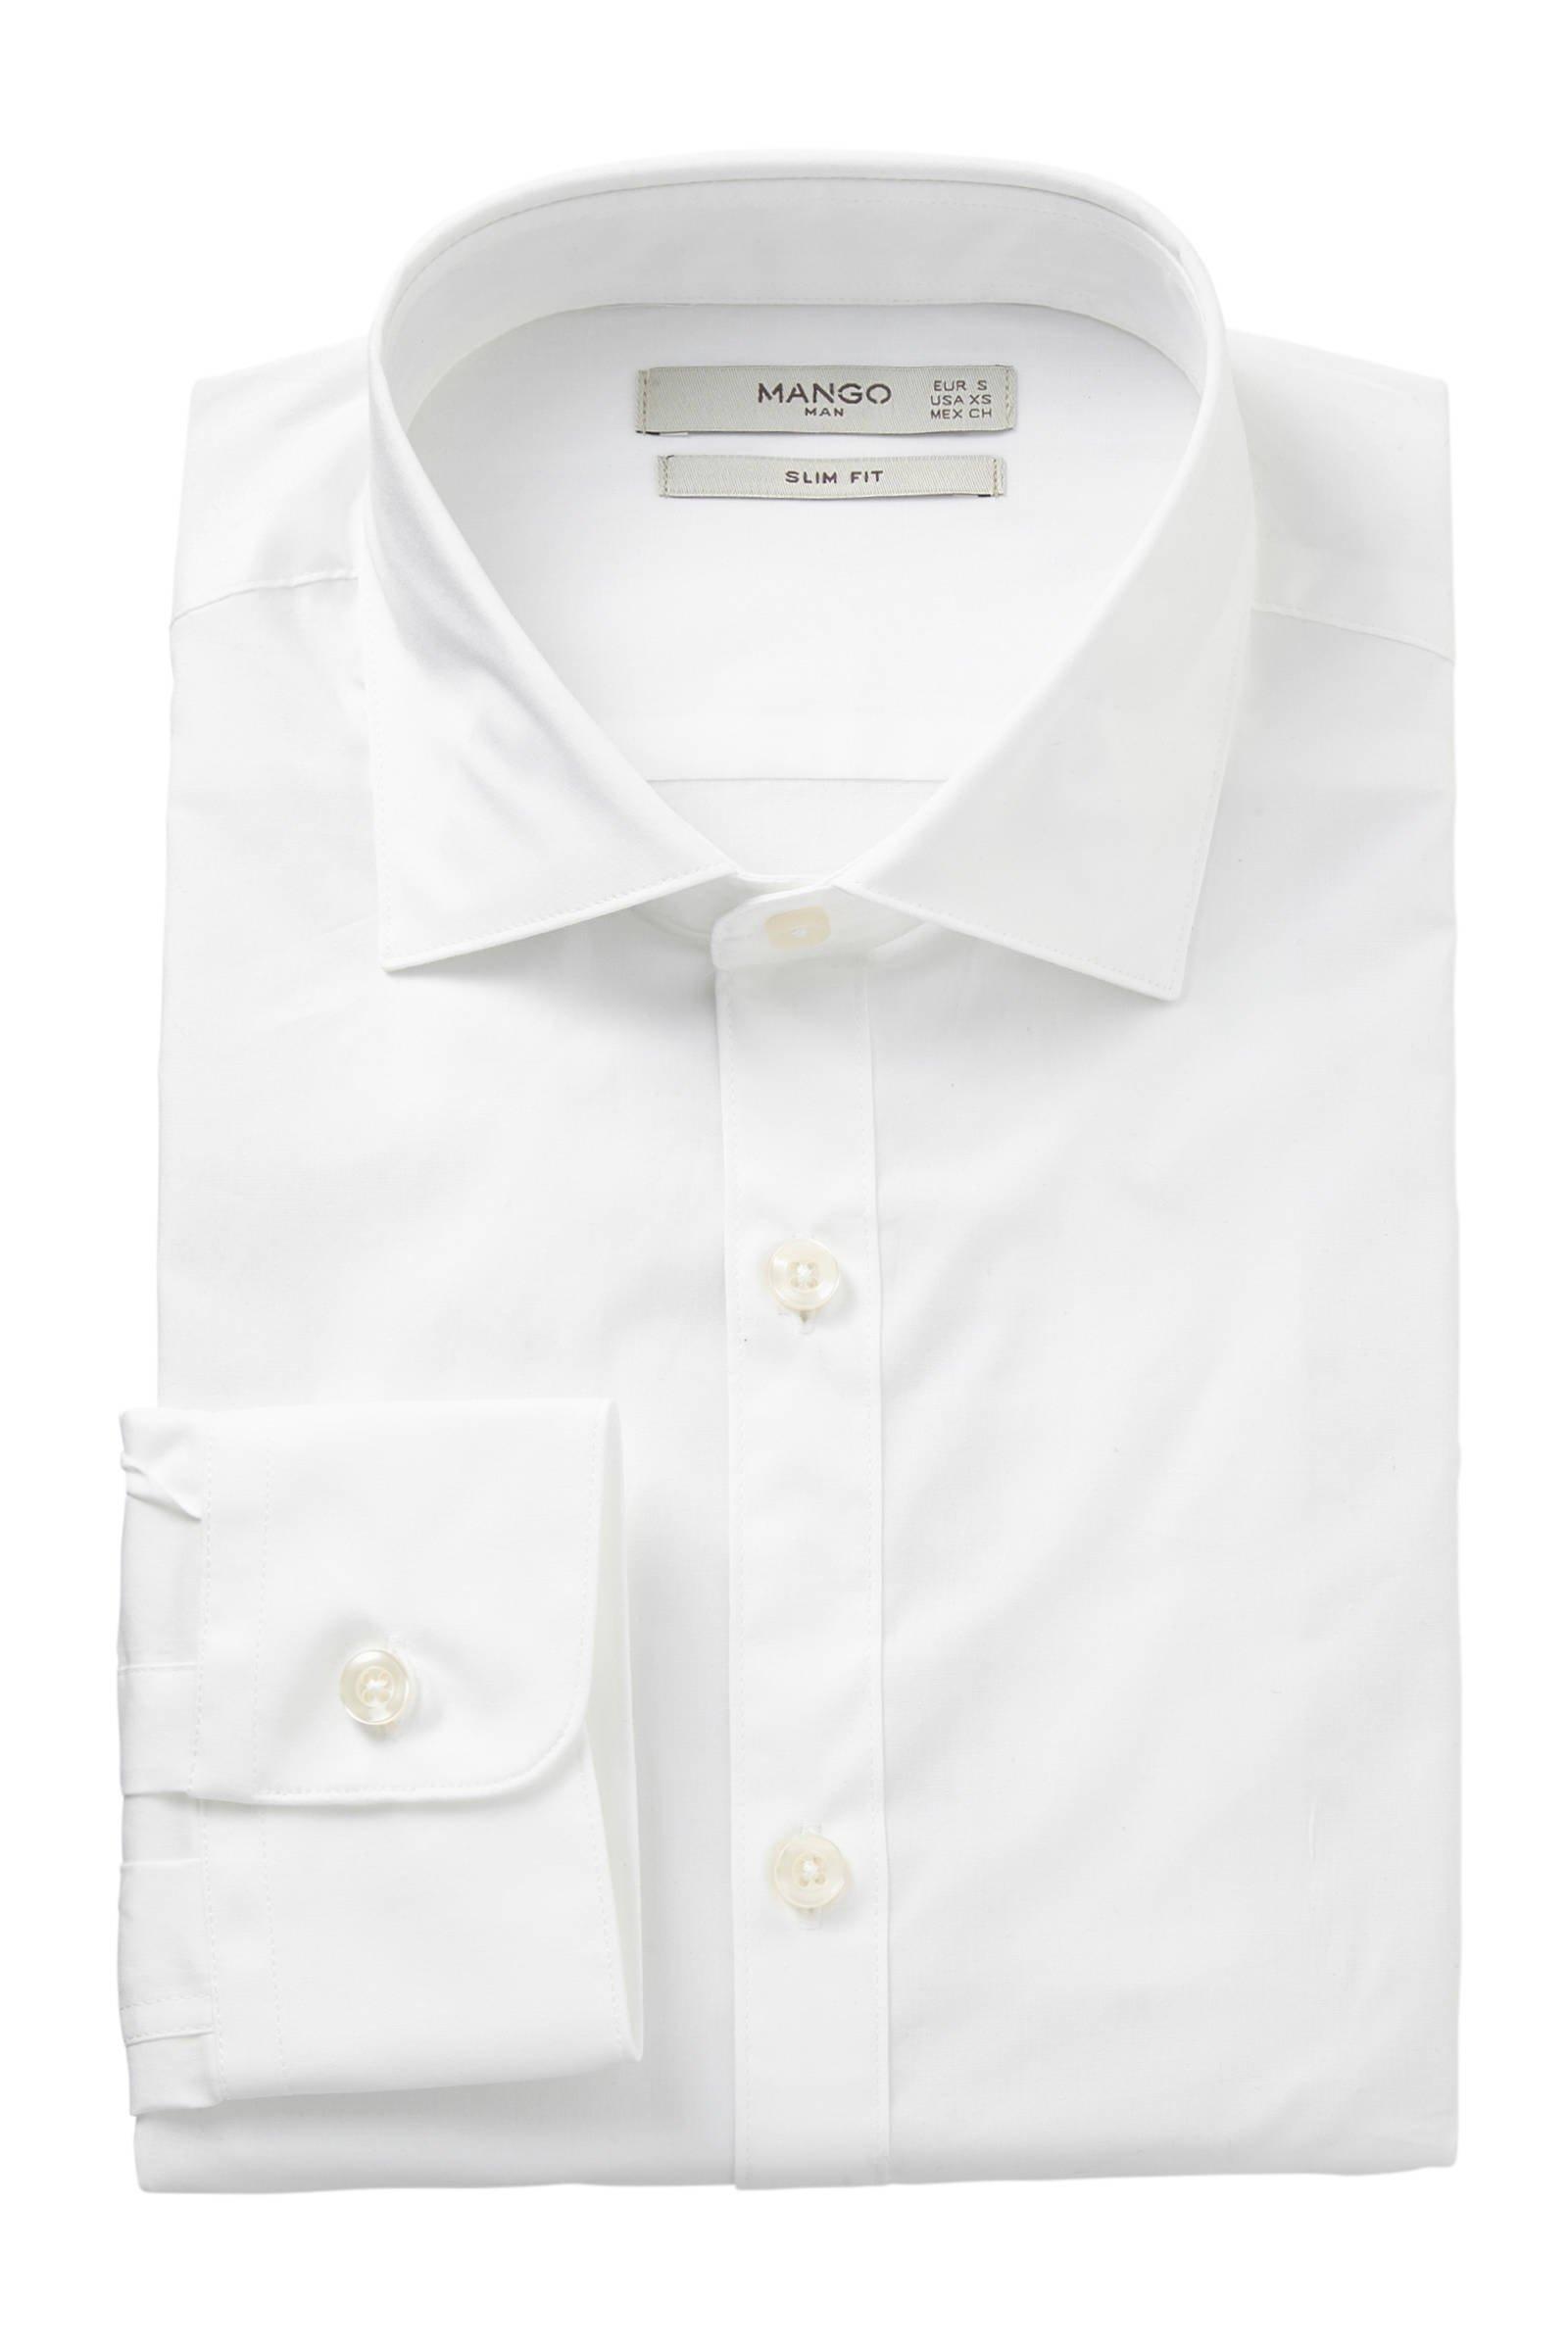 Mango Man Overhemd Slim Fit WitWehkamp HIWED29